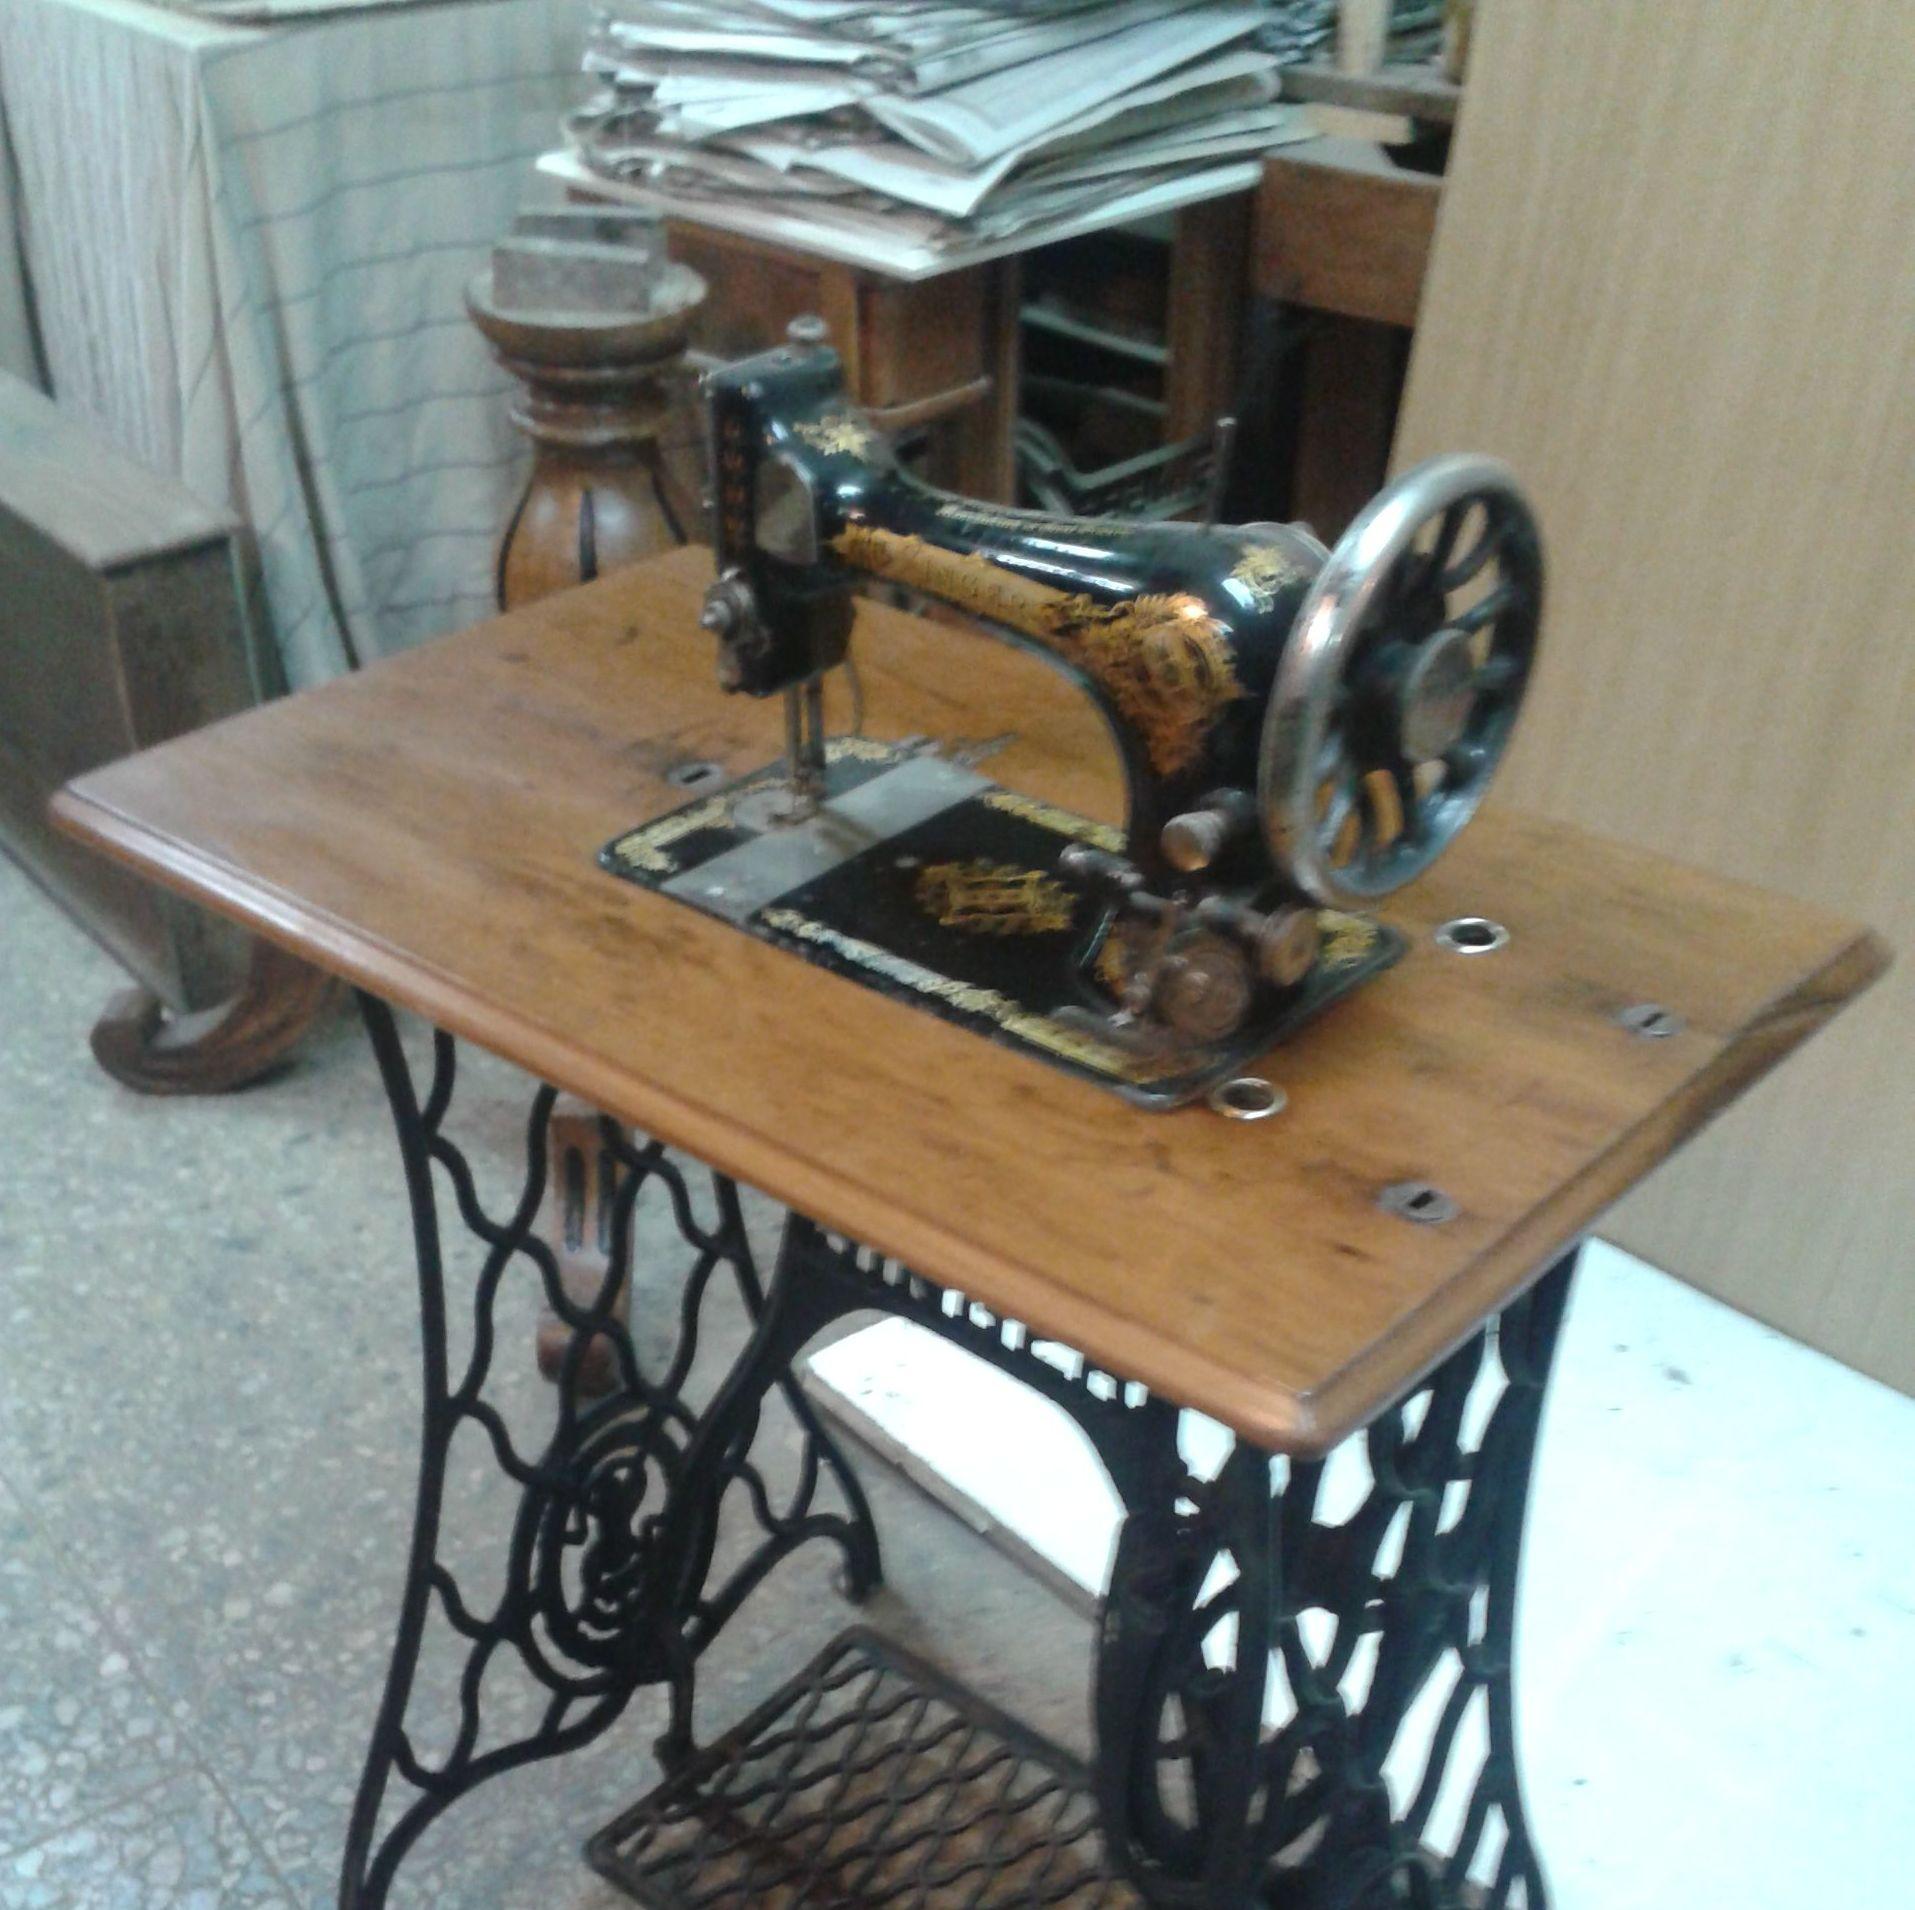 Maquina de coser restaurada